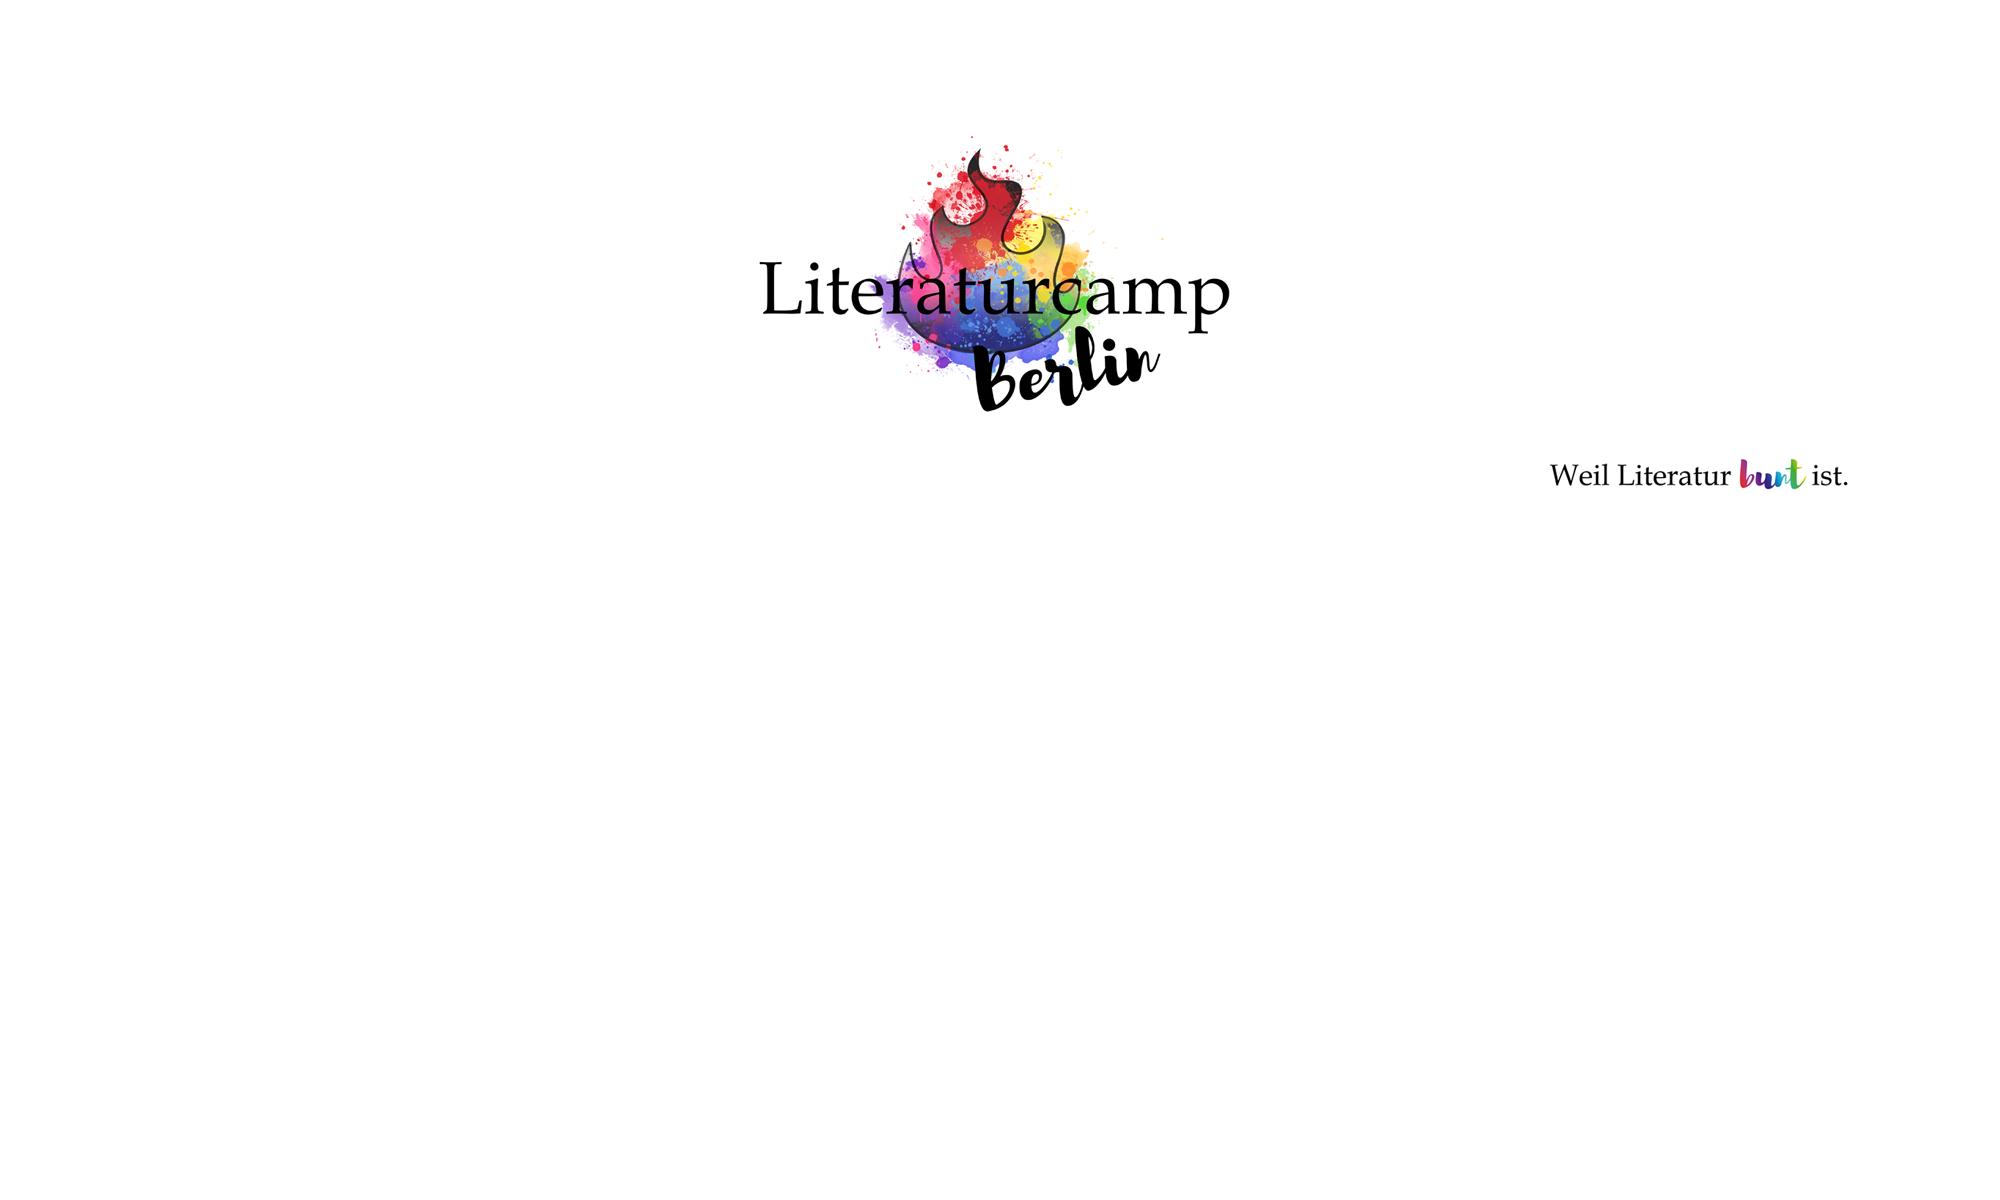 Literaturcamp Berlin